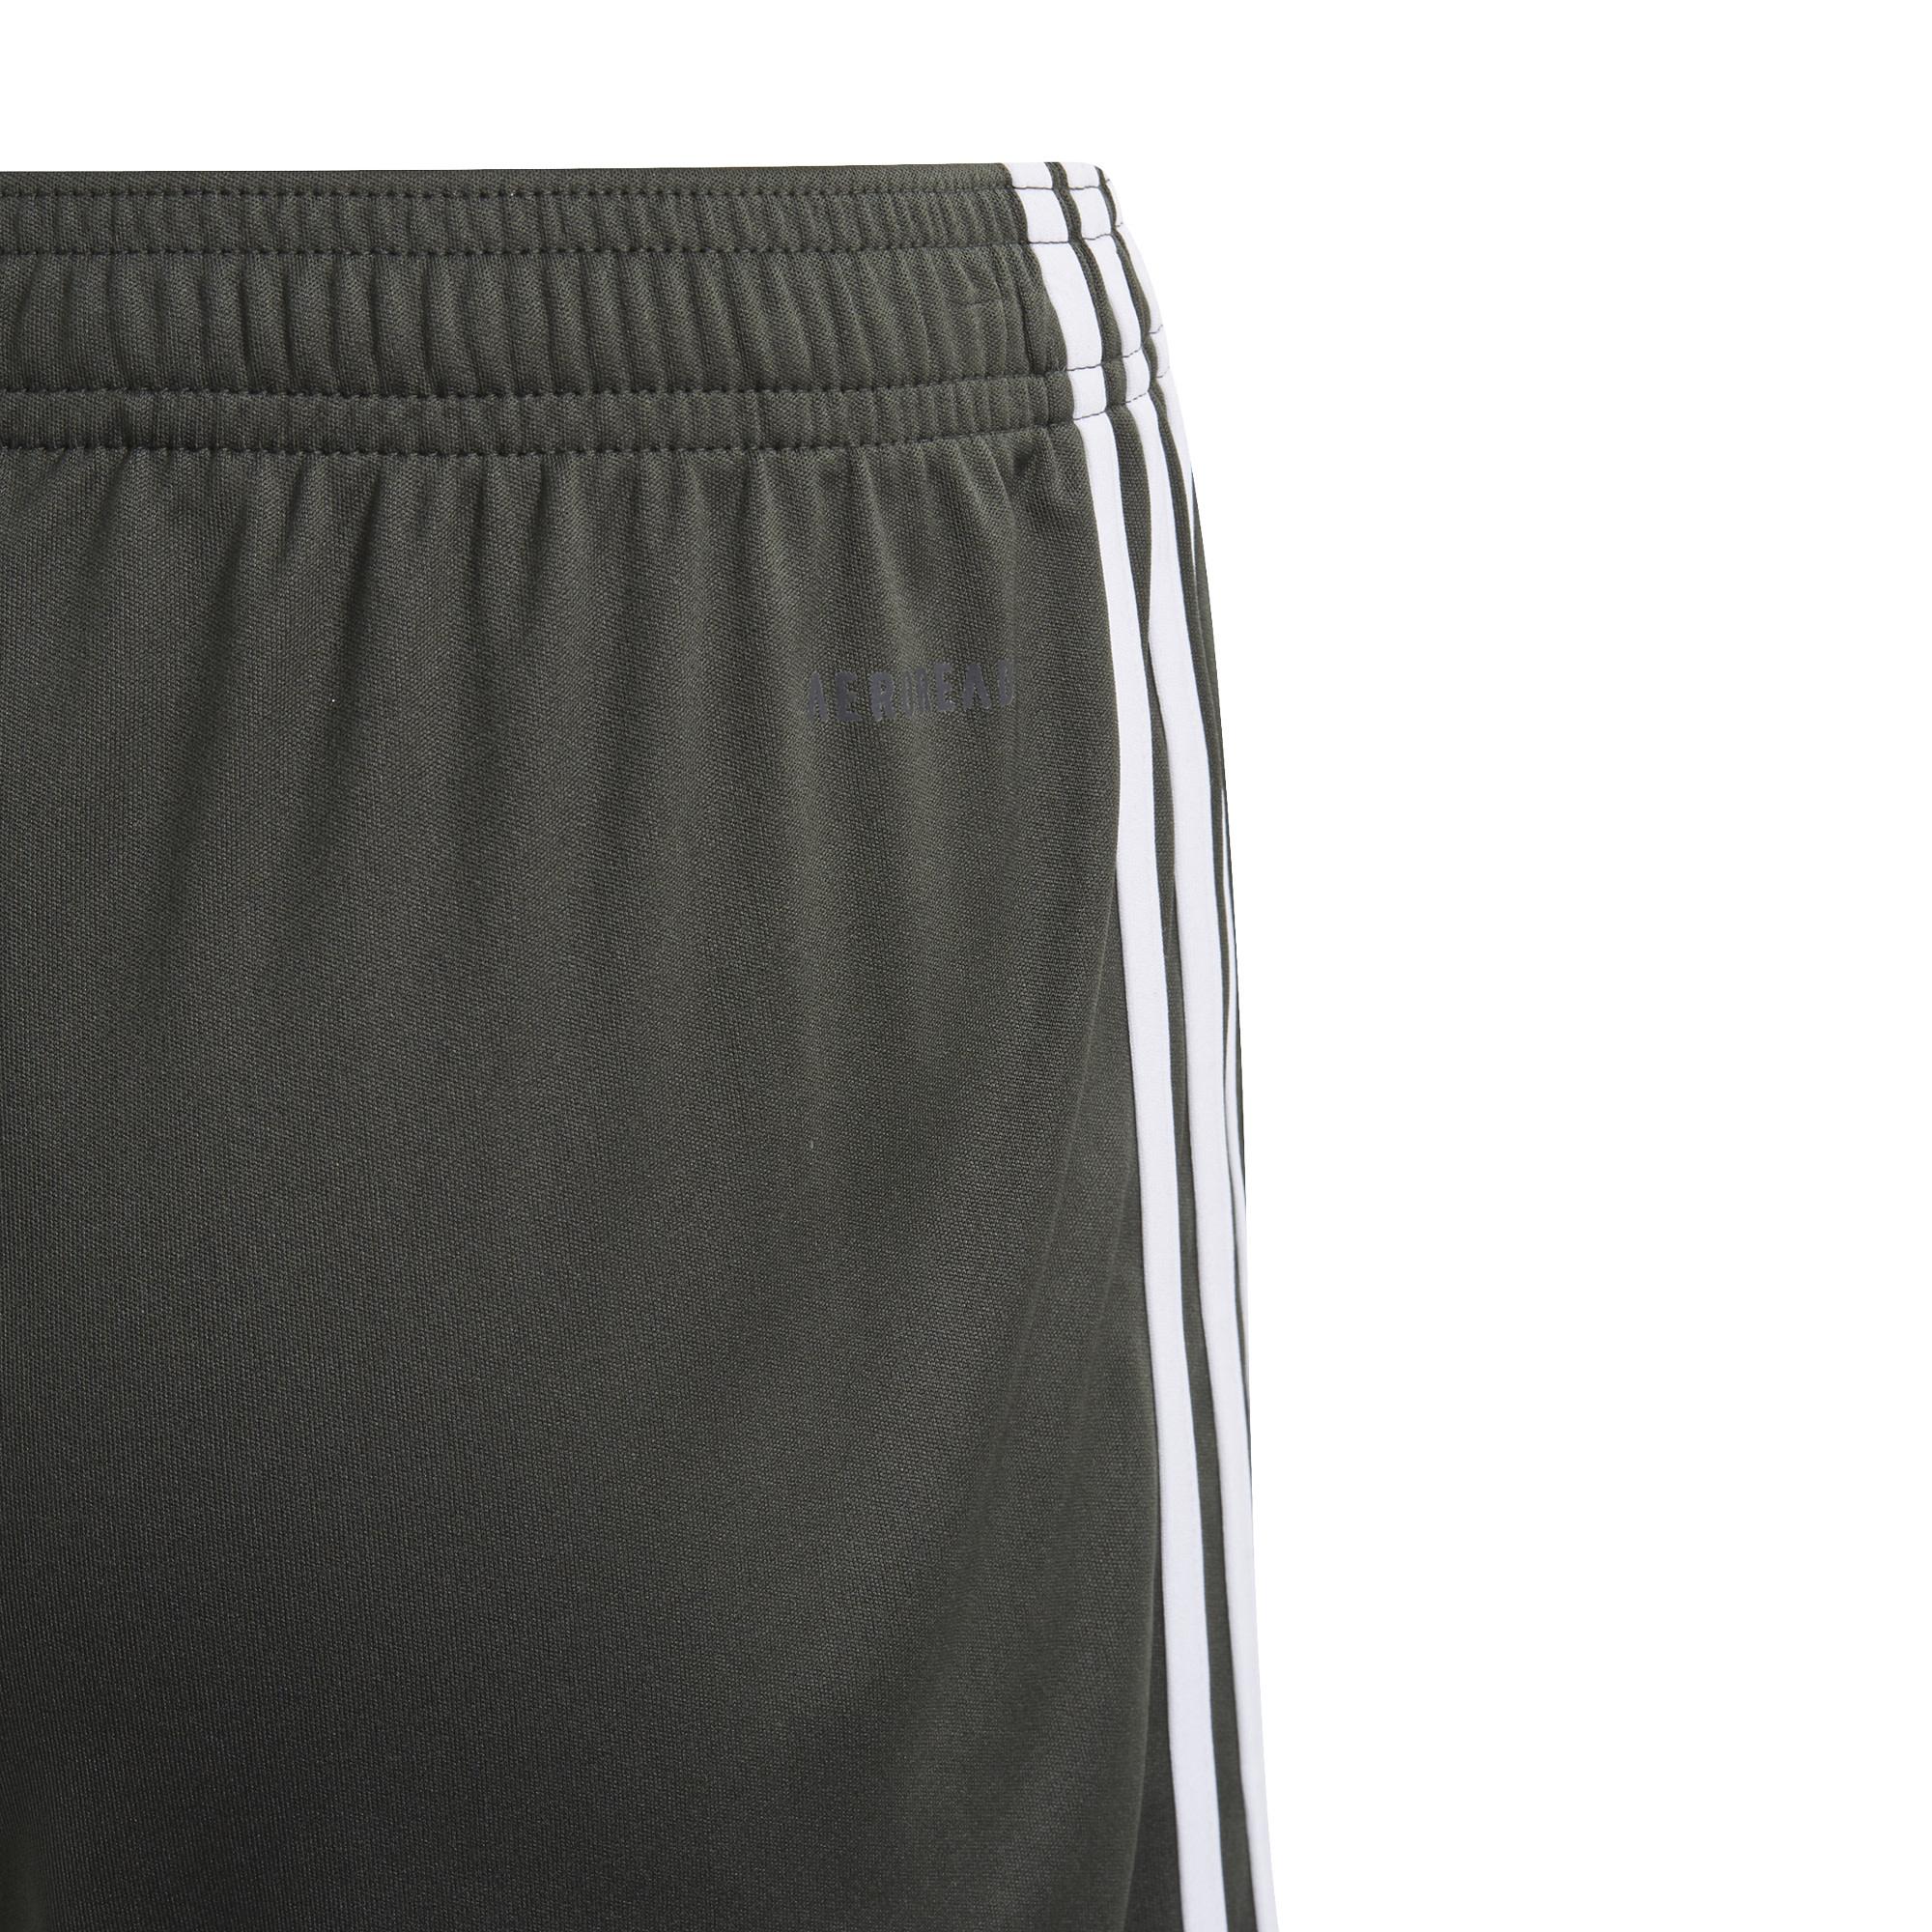 Adidas ADIDAS JR Manchester United Away Short '20-'21